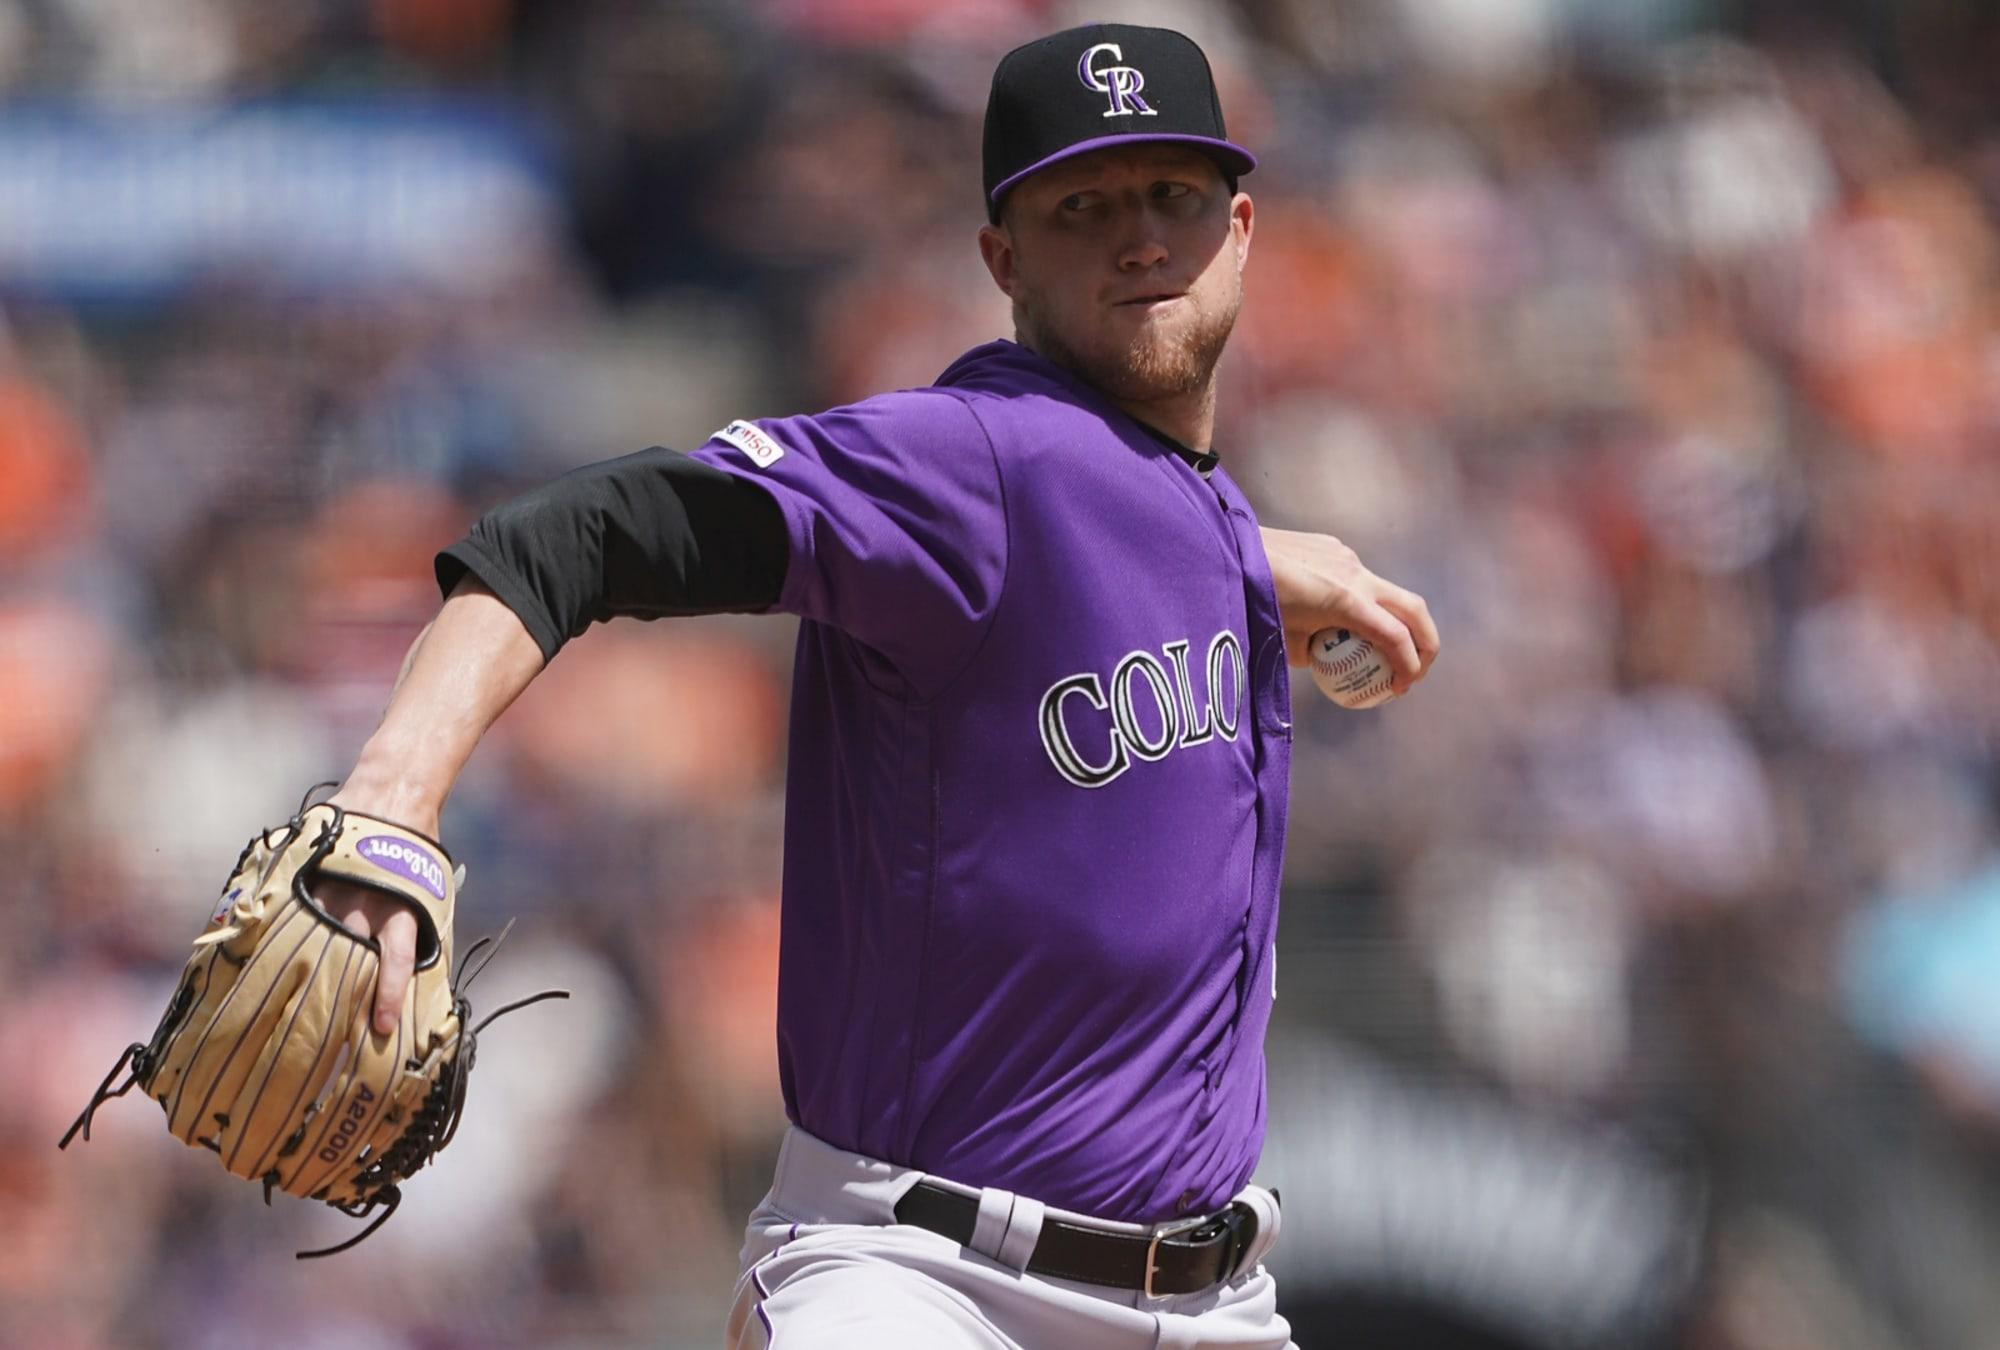 Colorado Rockies: Kyle Freeland sharp in return from back spasms